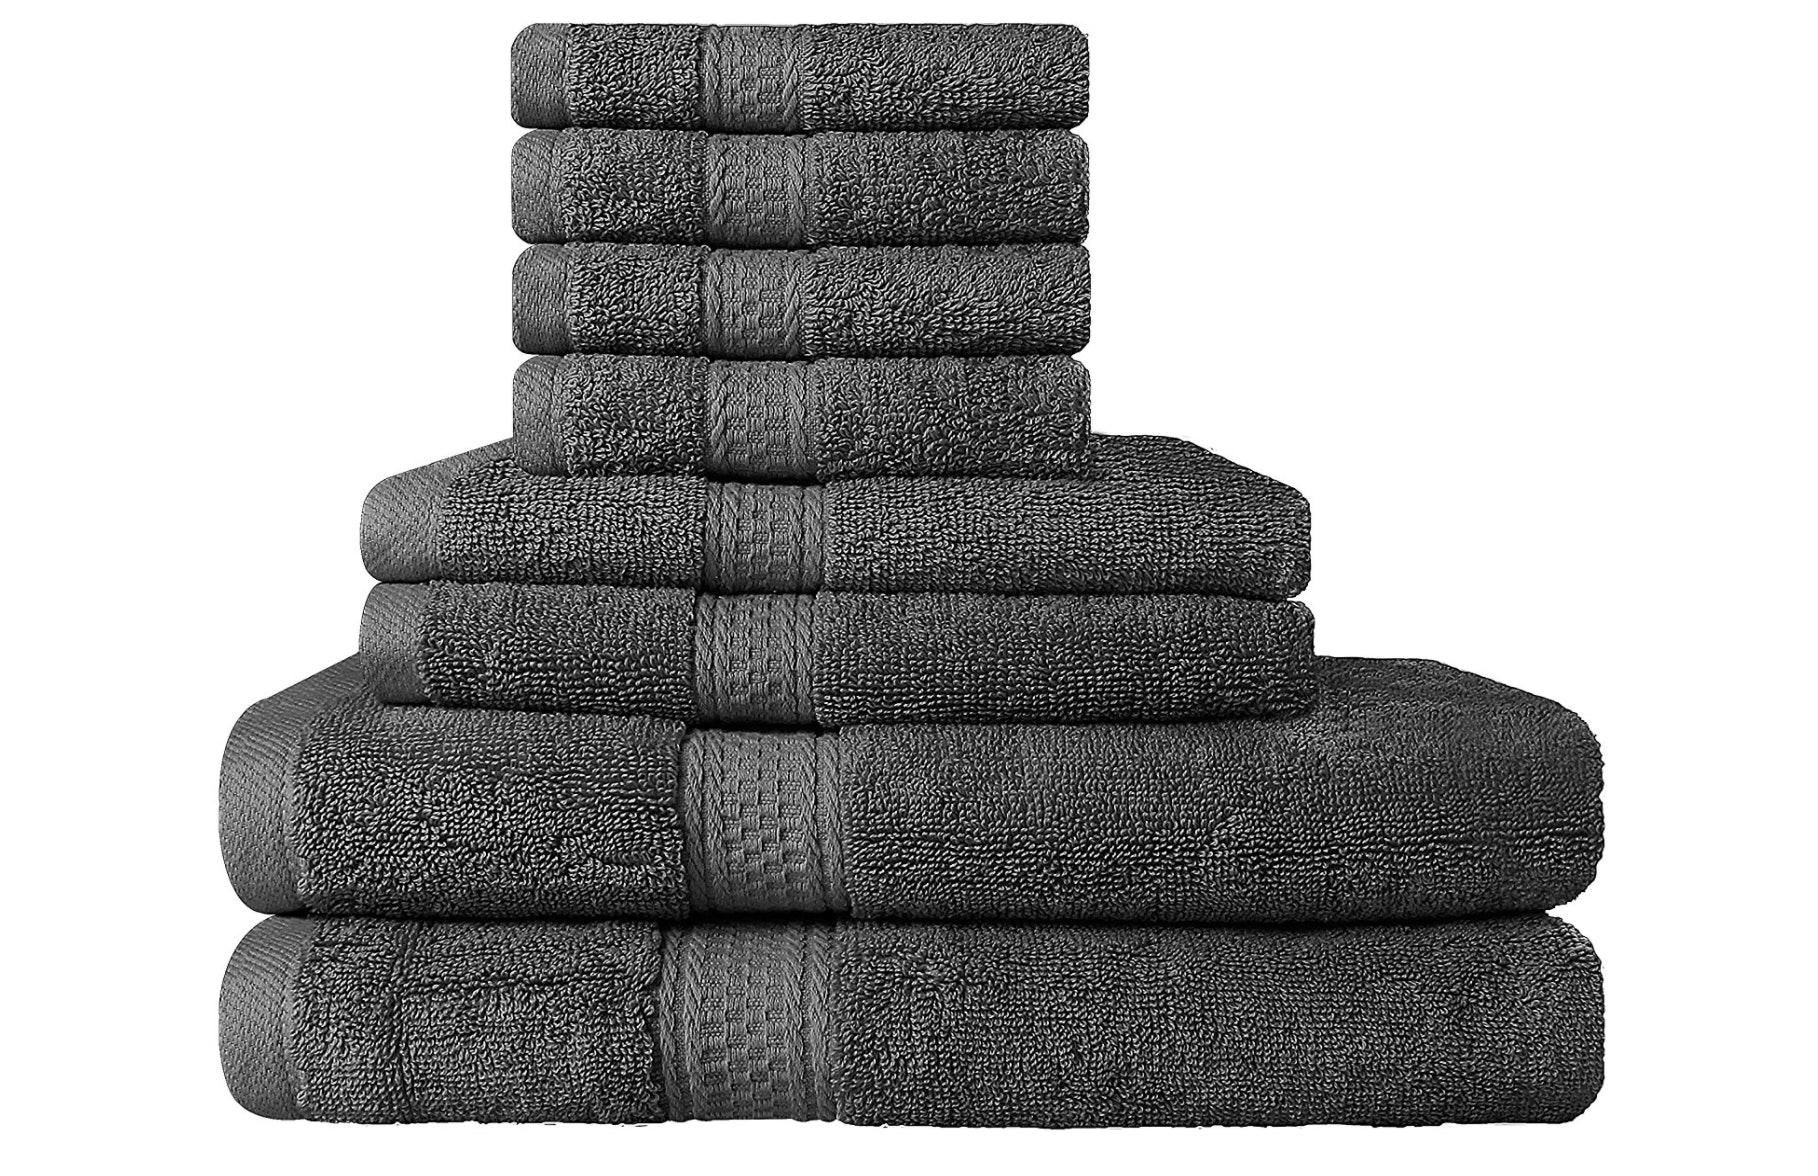 Utopia towels